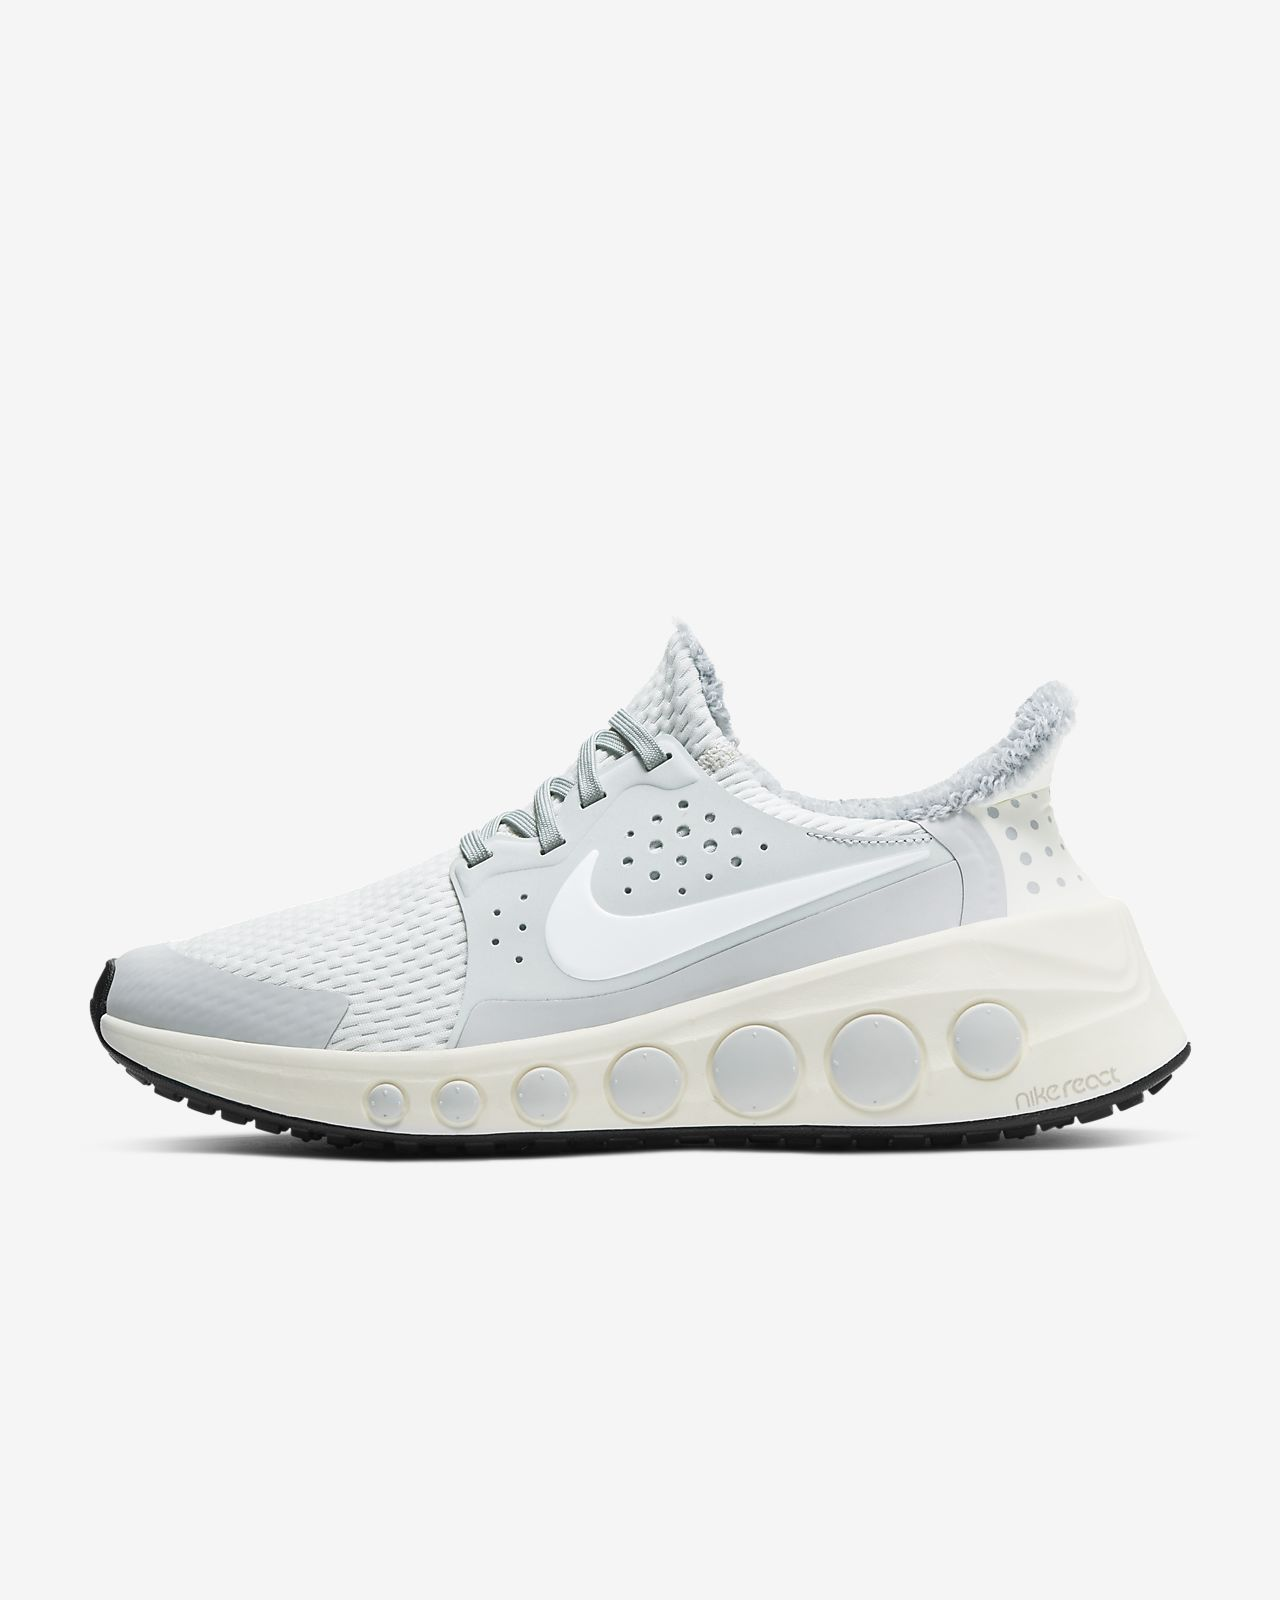 Nike CruzrOne (Pure Platinum) Shoe